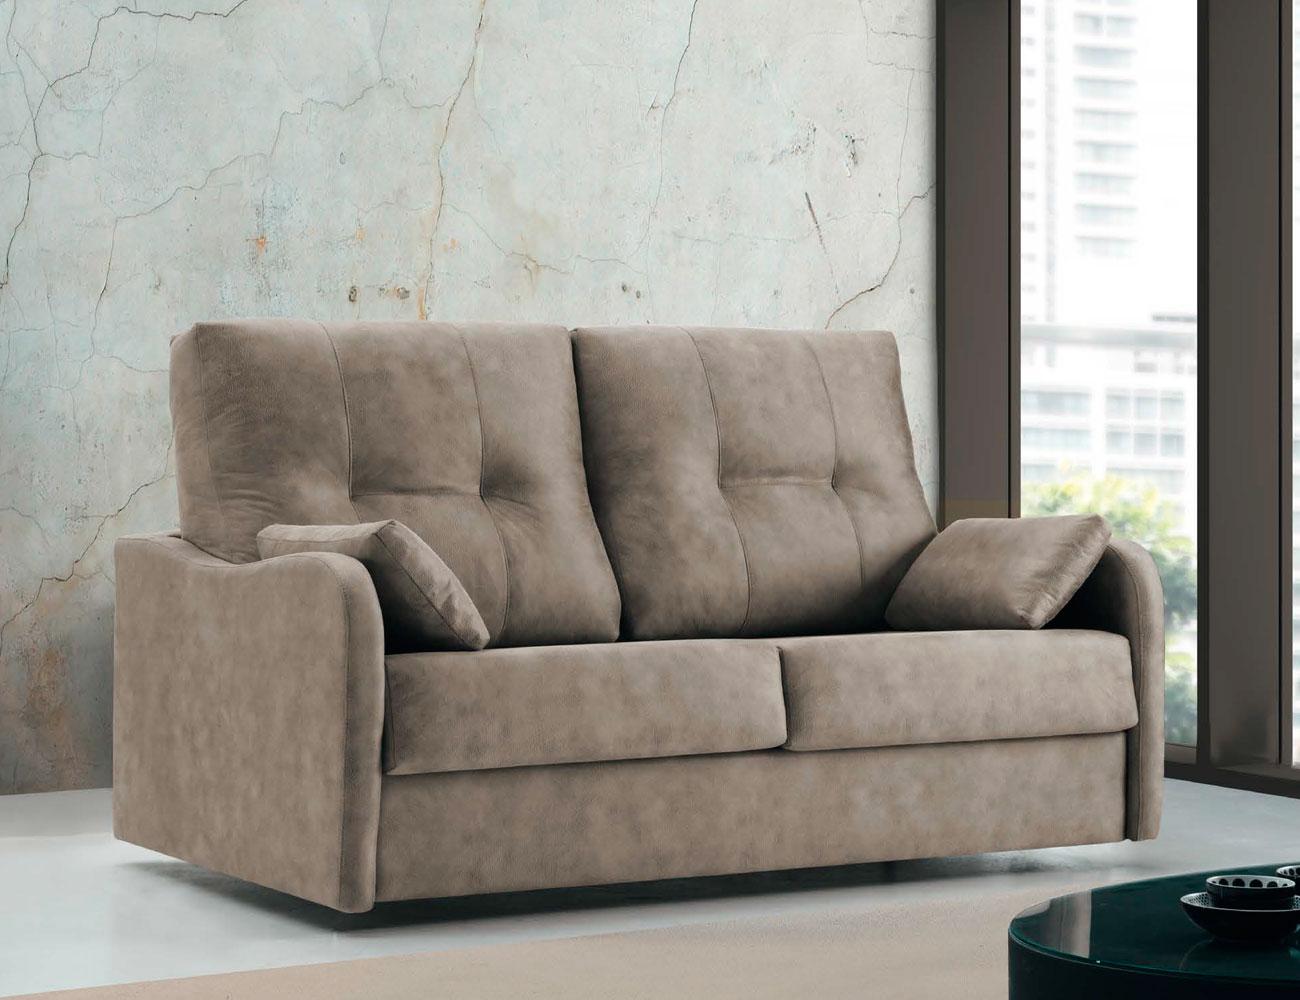 Sofa cama moderno apertura italiano mini